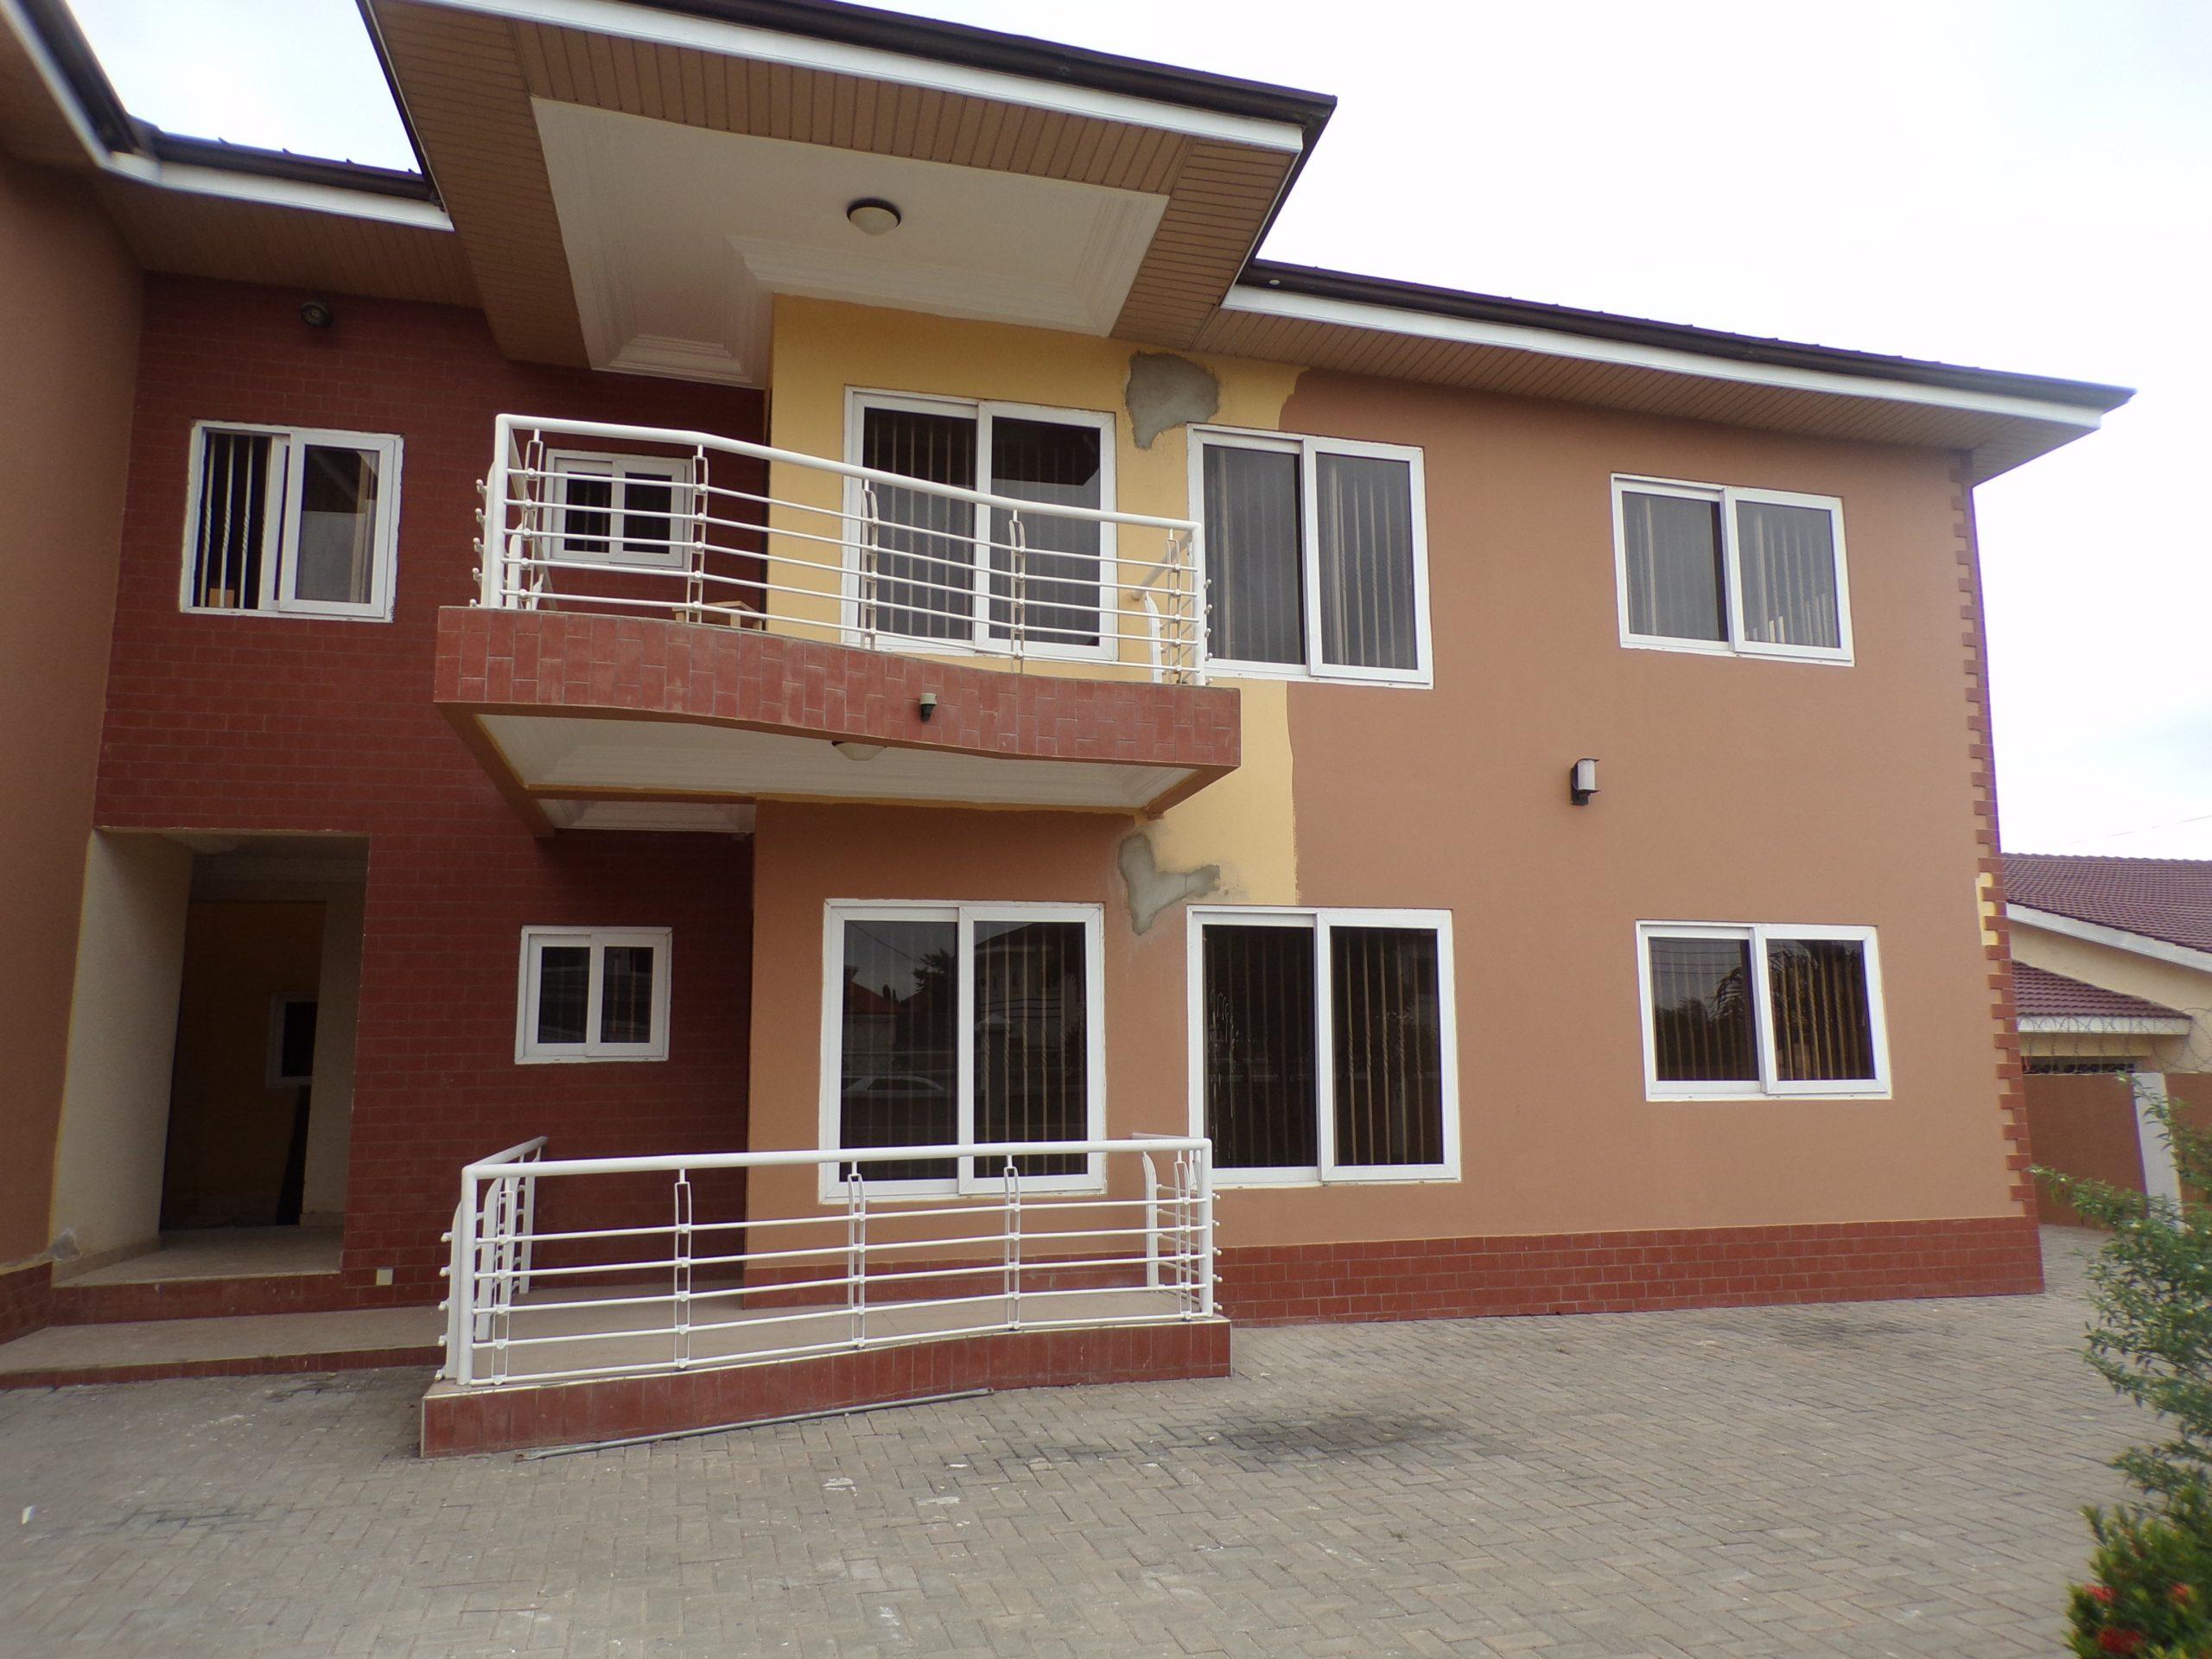 3 bedroom Apartment for Rent in Adjiringanor